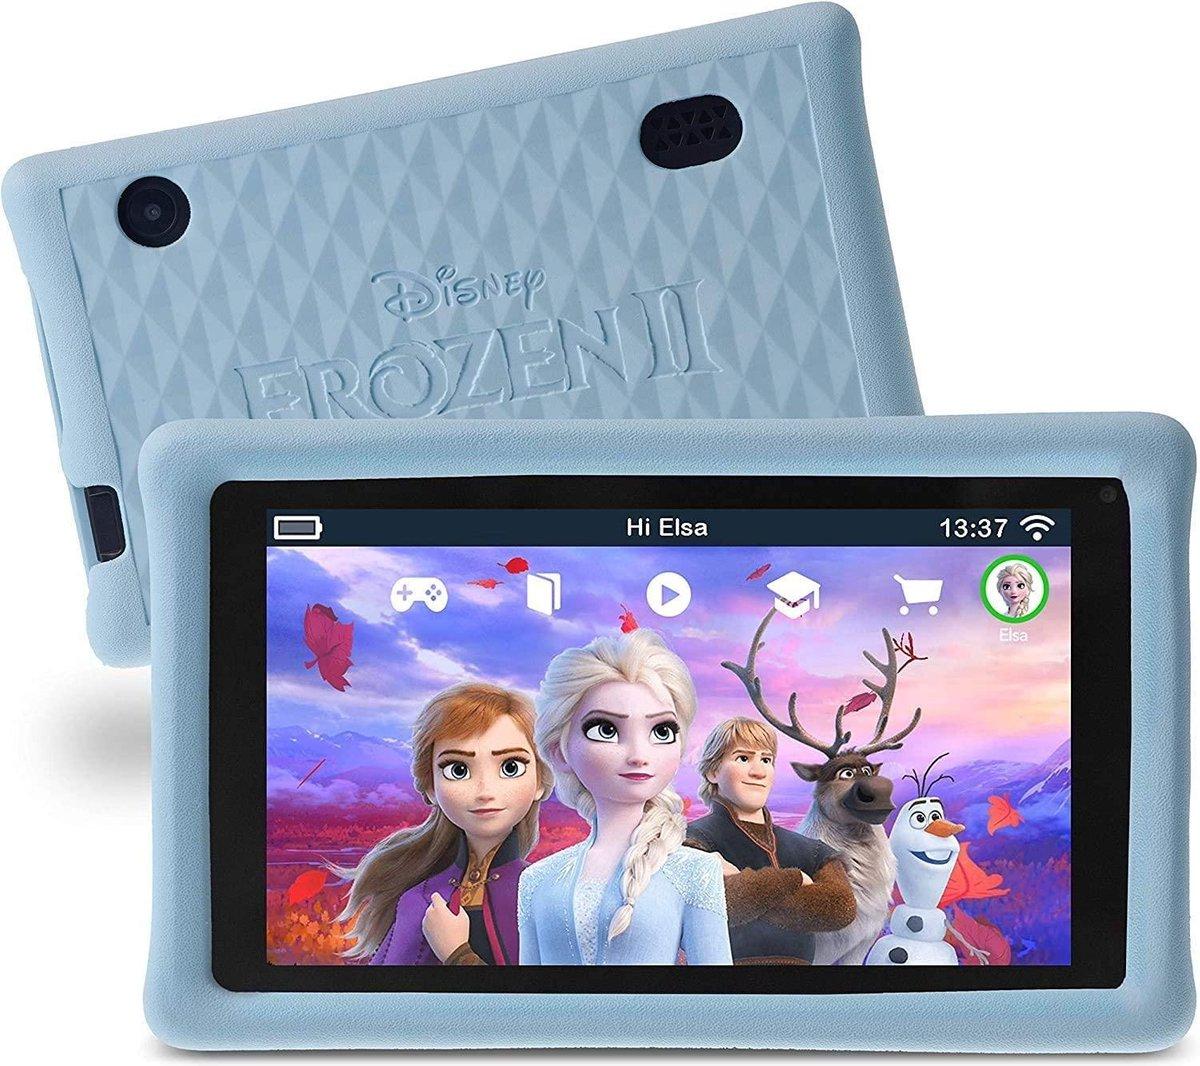 Pebble Gear Kinder Tablet Disney Frozen Set Draagtas - 7 inch - 1GB - Android 8.1- 500 games - Ouderlijke controle